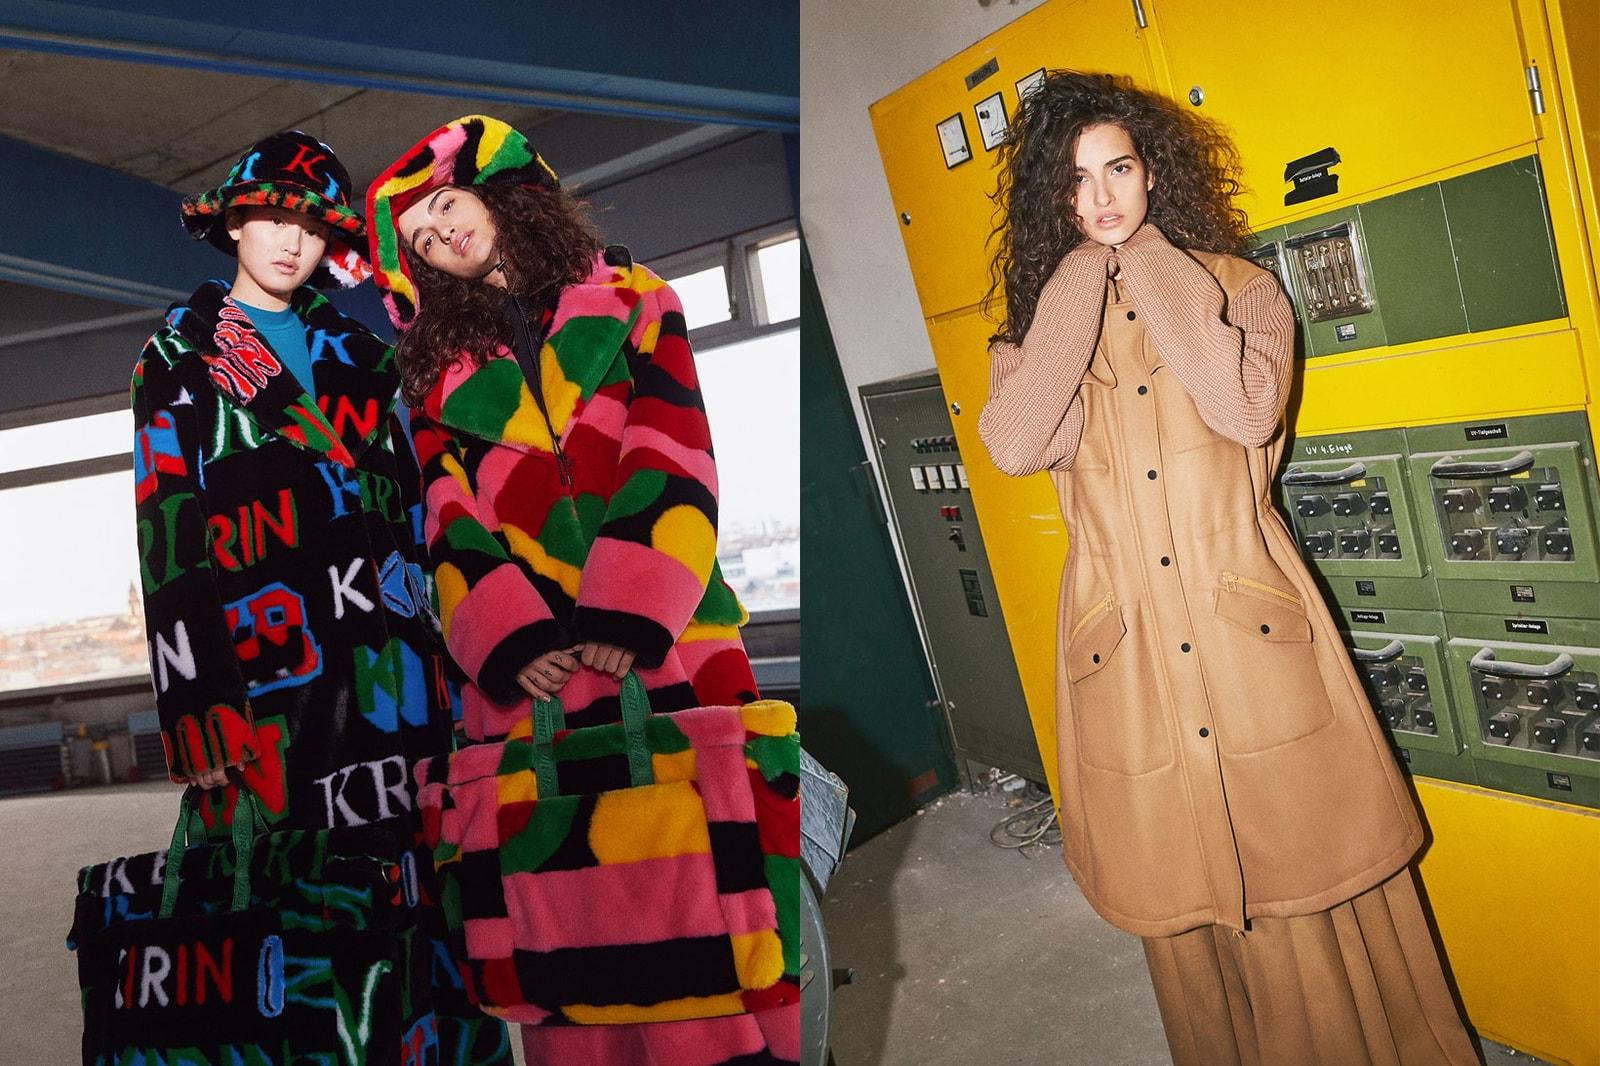 korean fashion emerging female fashion designers brands kirin peggy gou fall winter 2020 fw20 lookbook fur hat coat